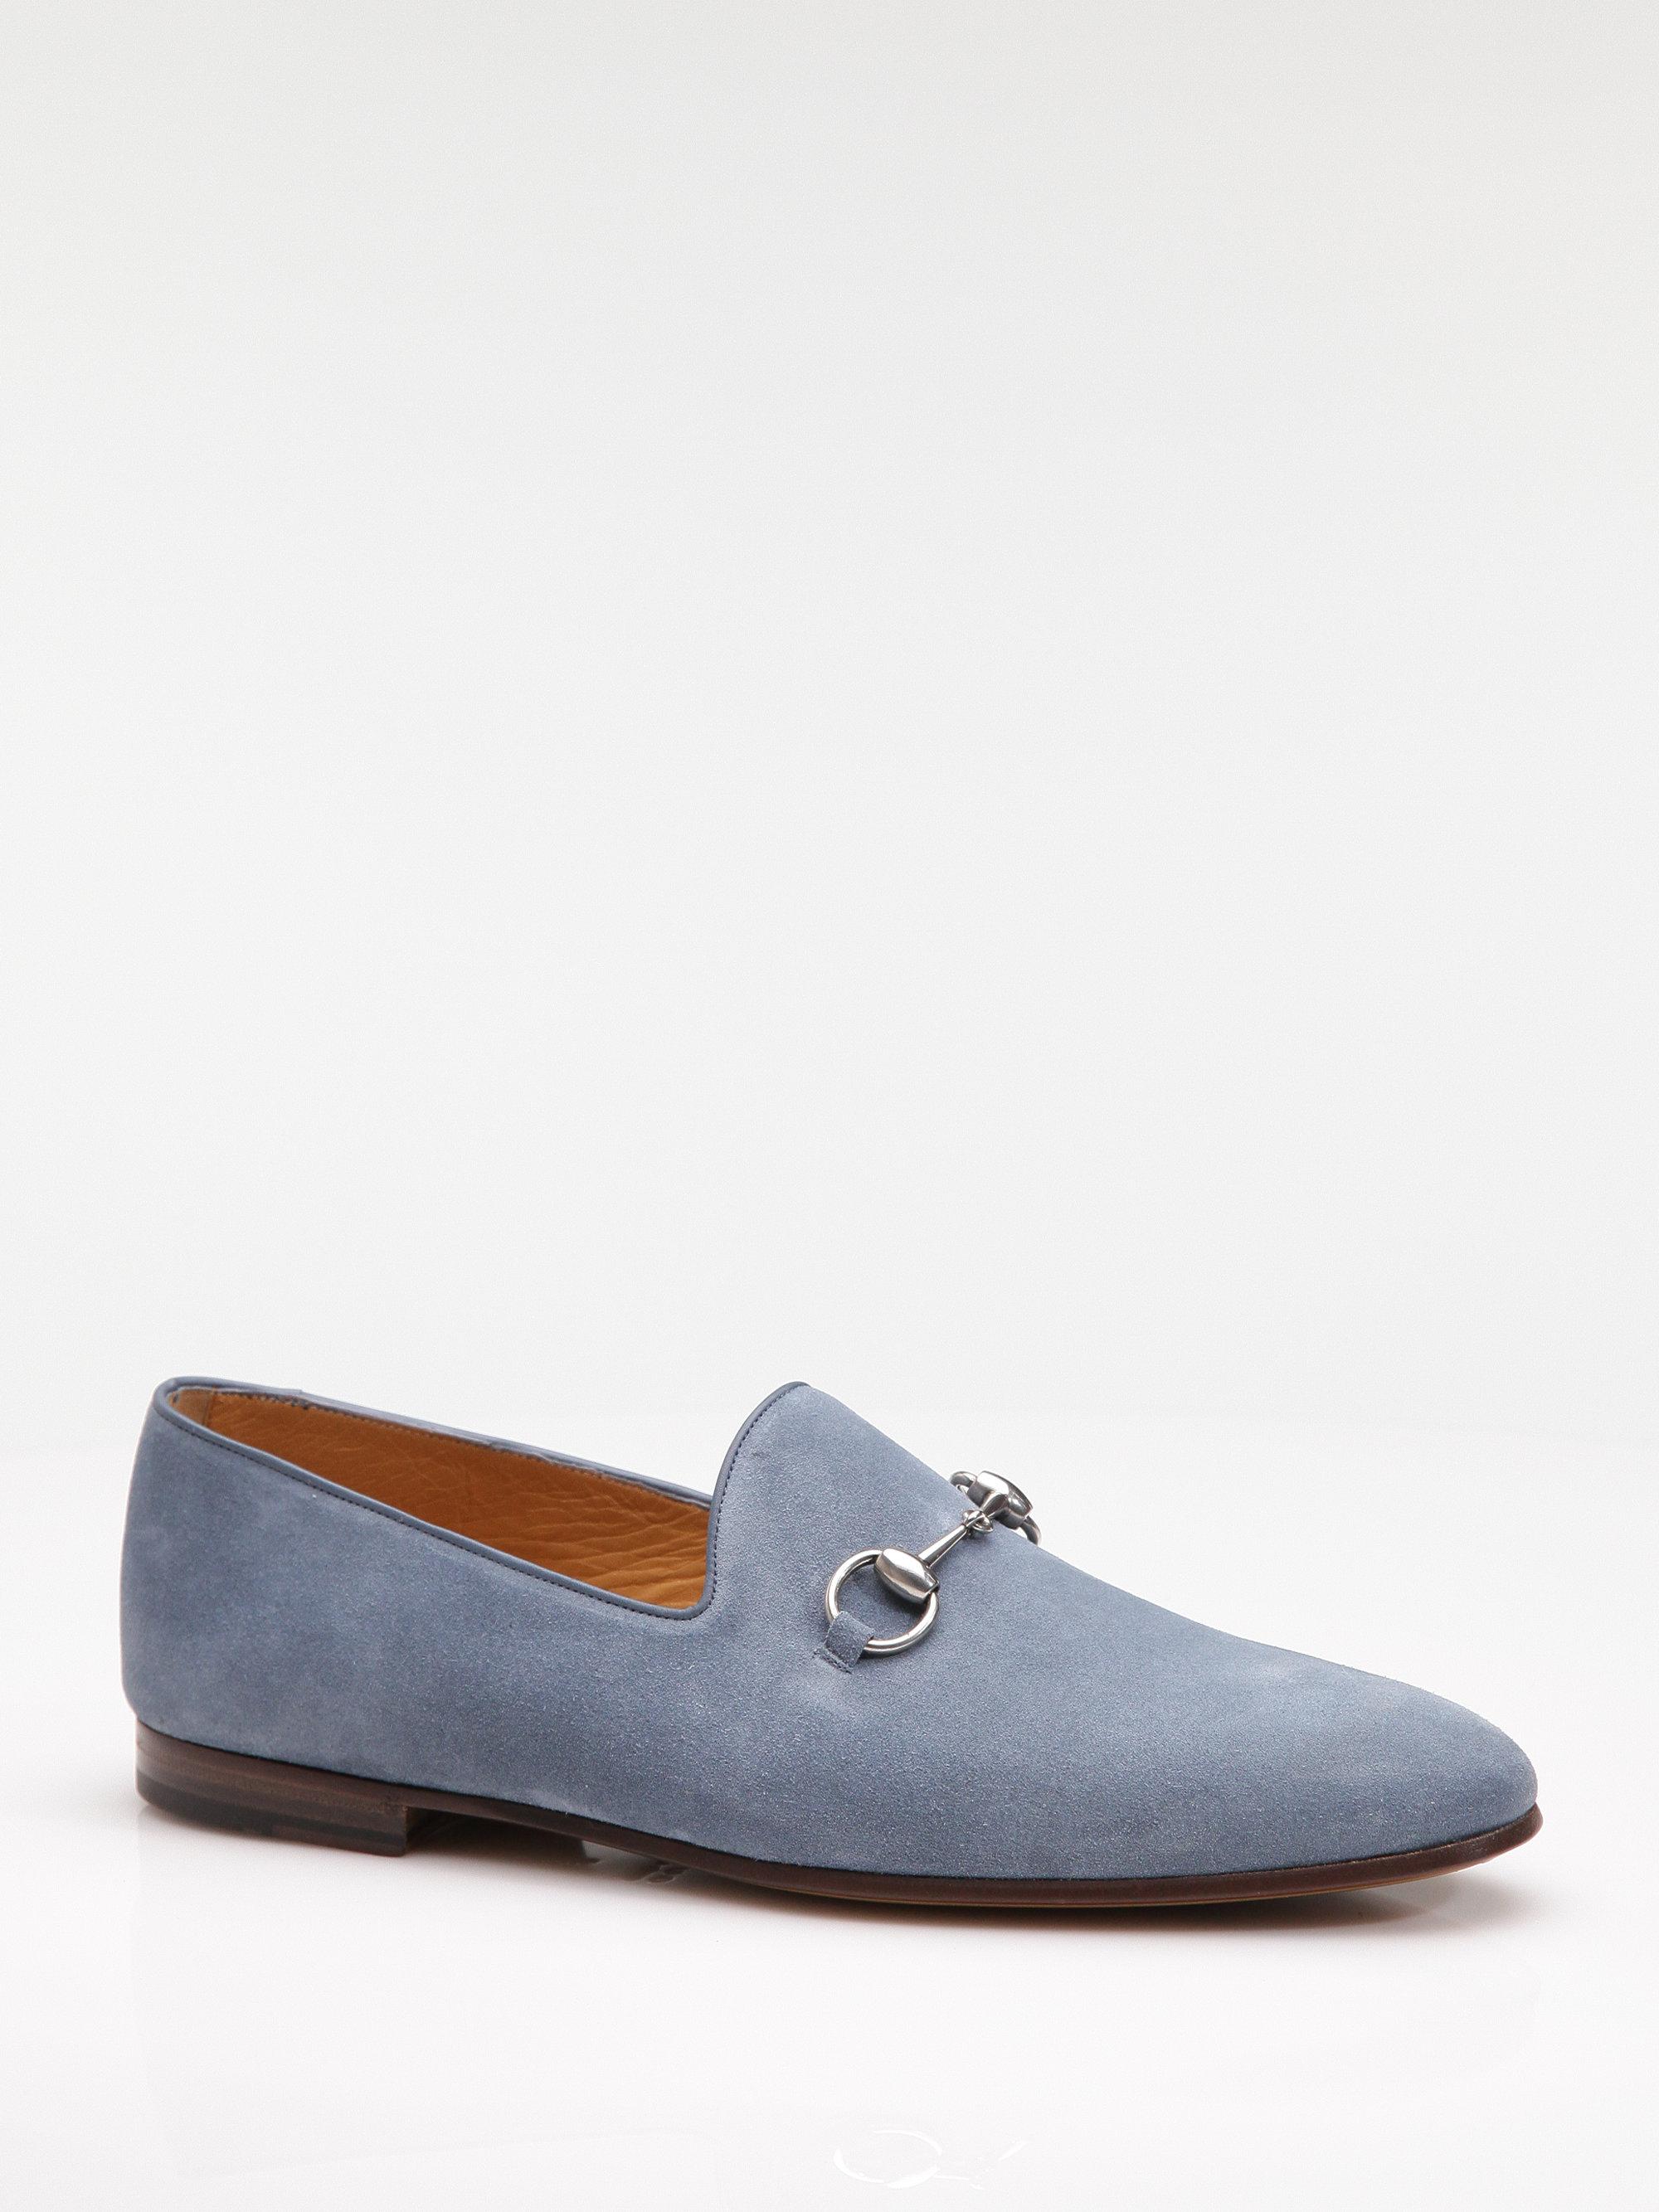 Gucci Loafer In Blue For Men Lyst